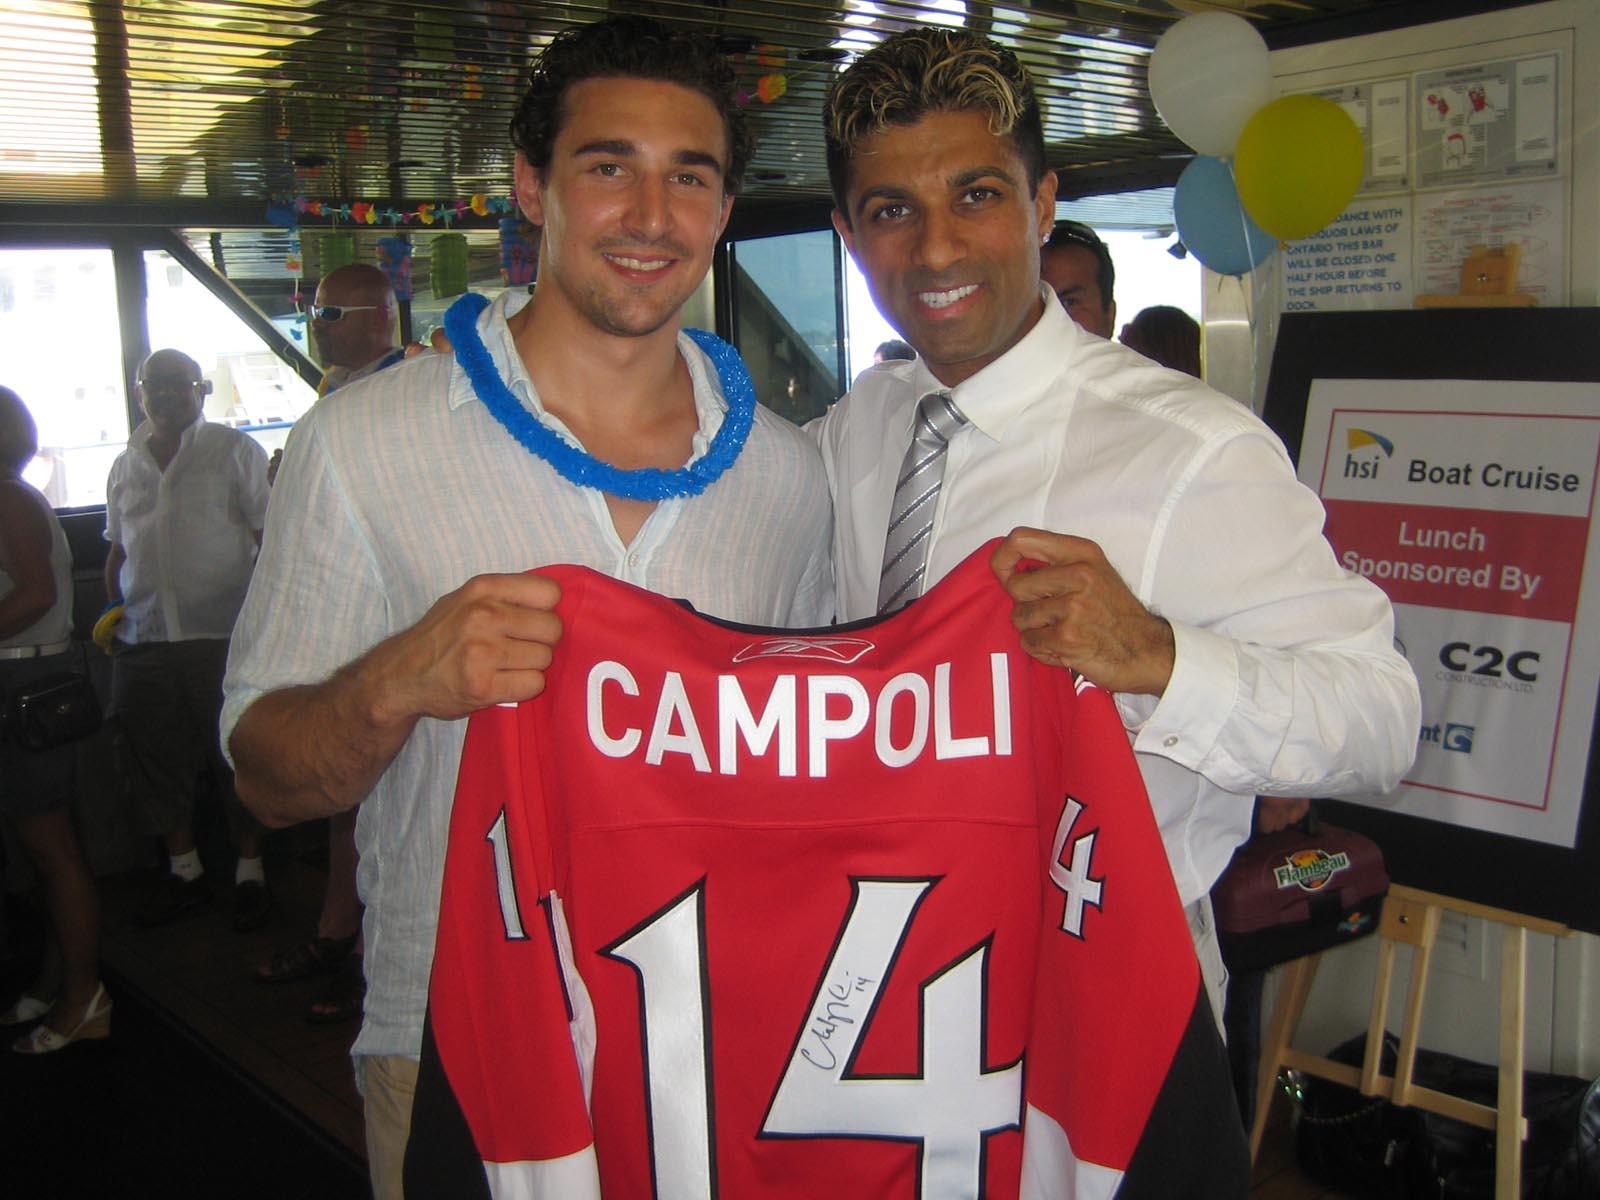 Chris Campoli